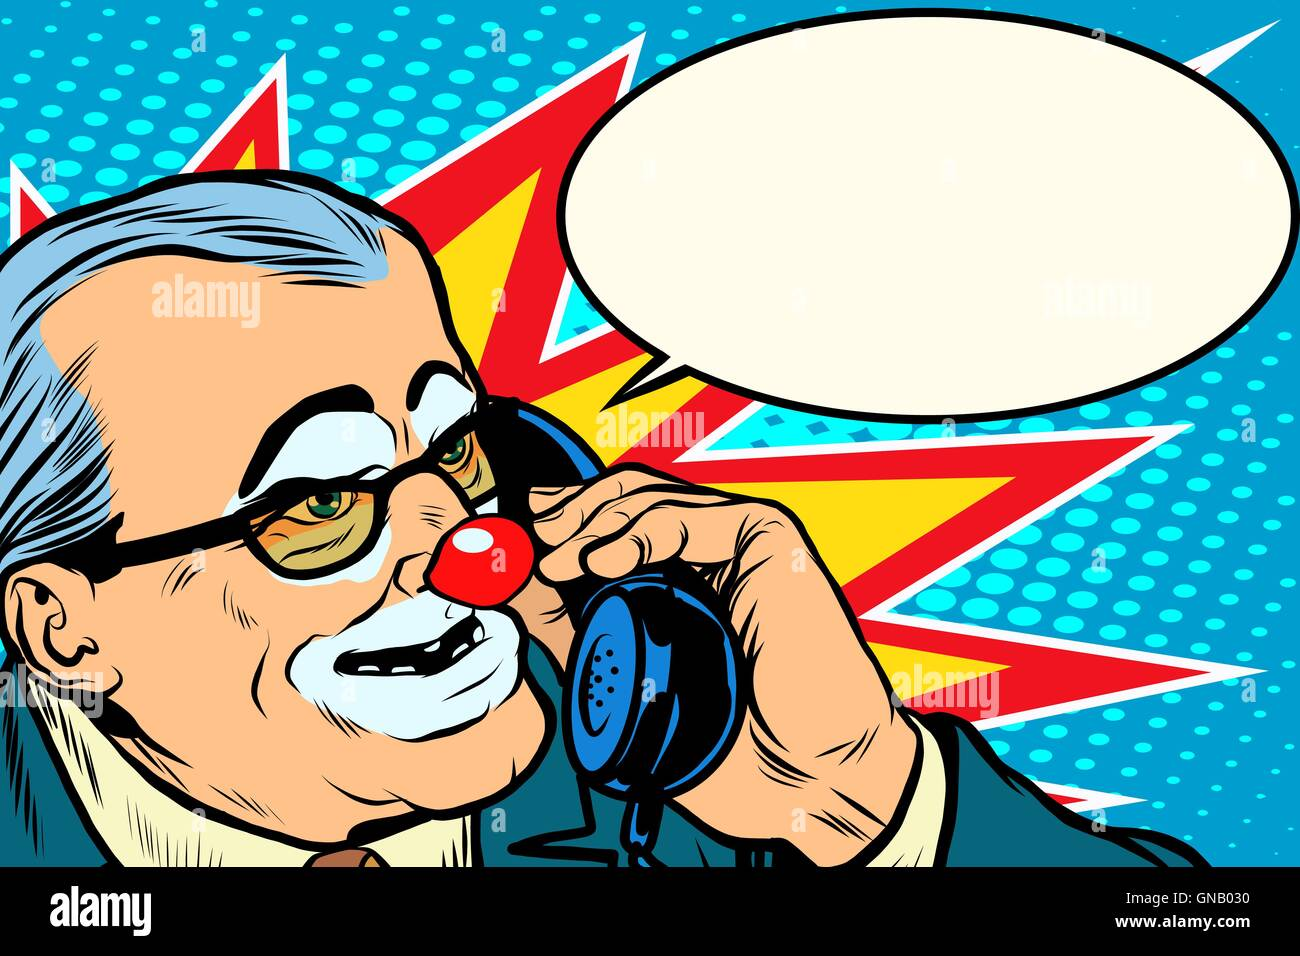 boss clown on the phone - Stock Image